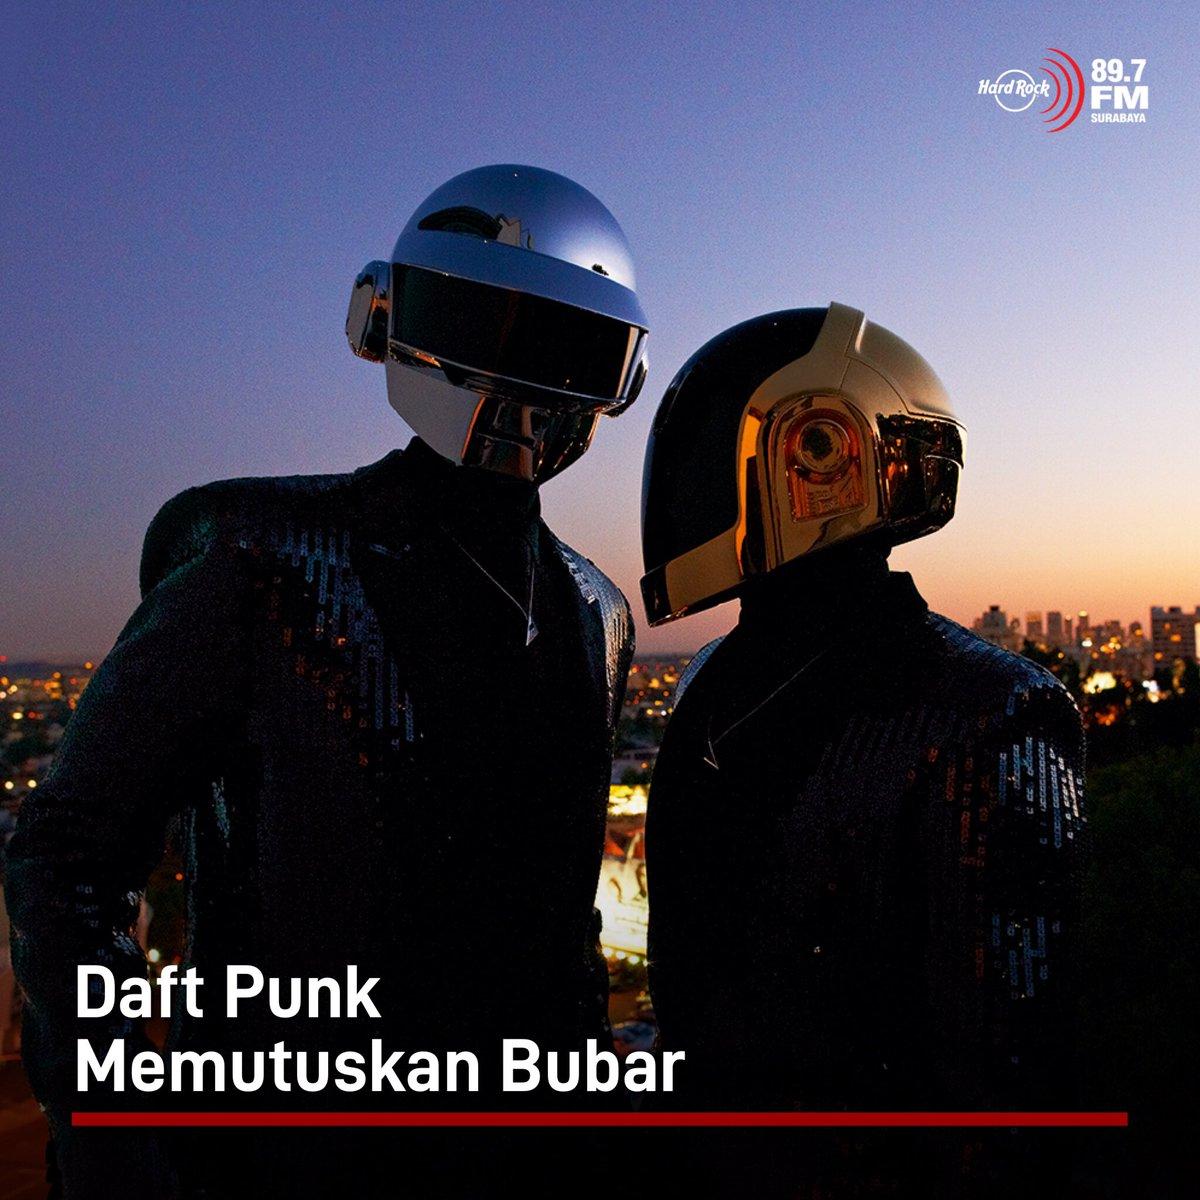 #HRFMNews Daft Punk mengumumkan bubar setelah 28 tahun.  Mereka mengumumkan keputusan itu melalui video berjudul Epilogue yang mereka upload di YouTube, dimana video ditutup dengan simbol tangan membentuk segitiga dengan tulisan 1993-2021 di bawahnya.